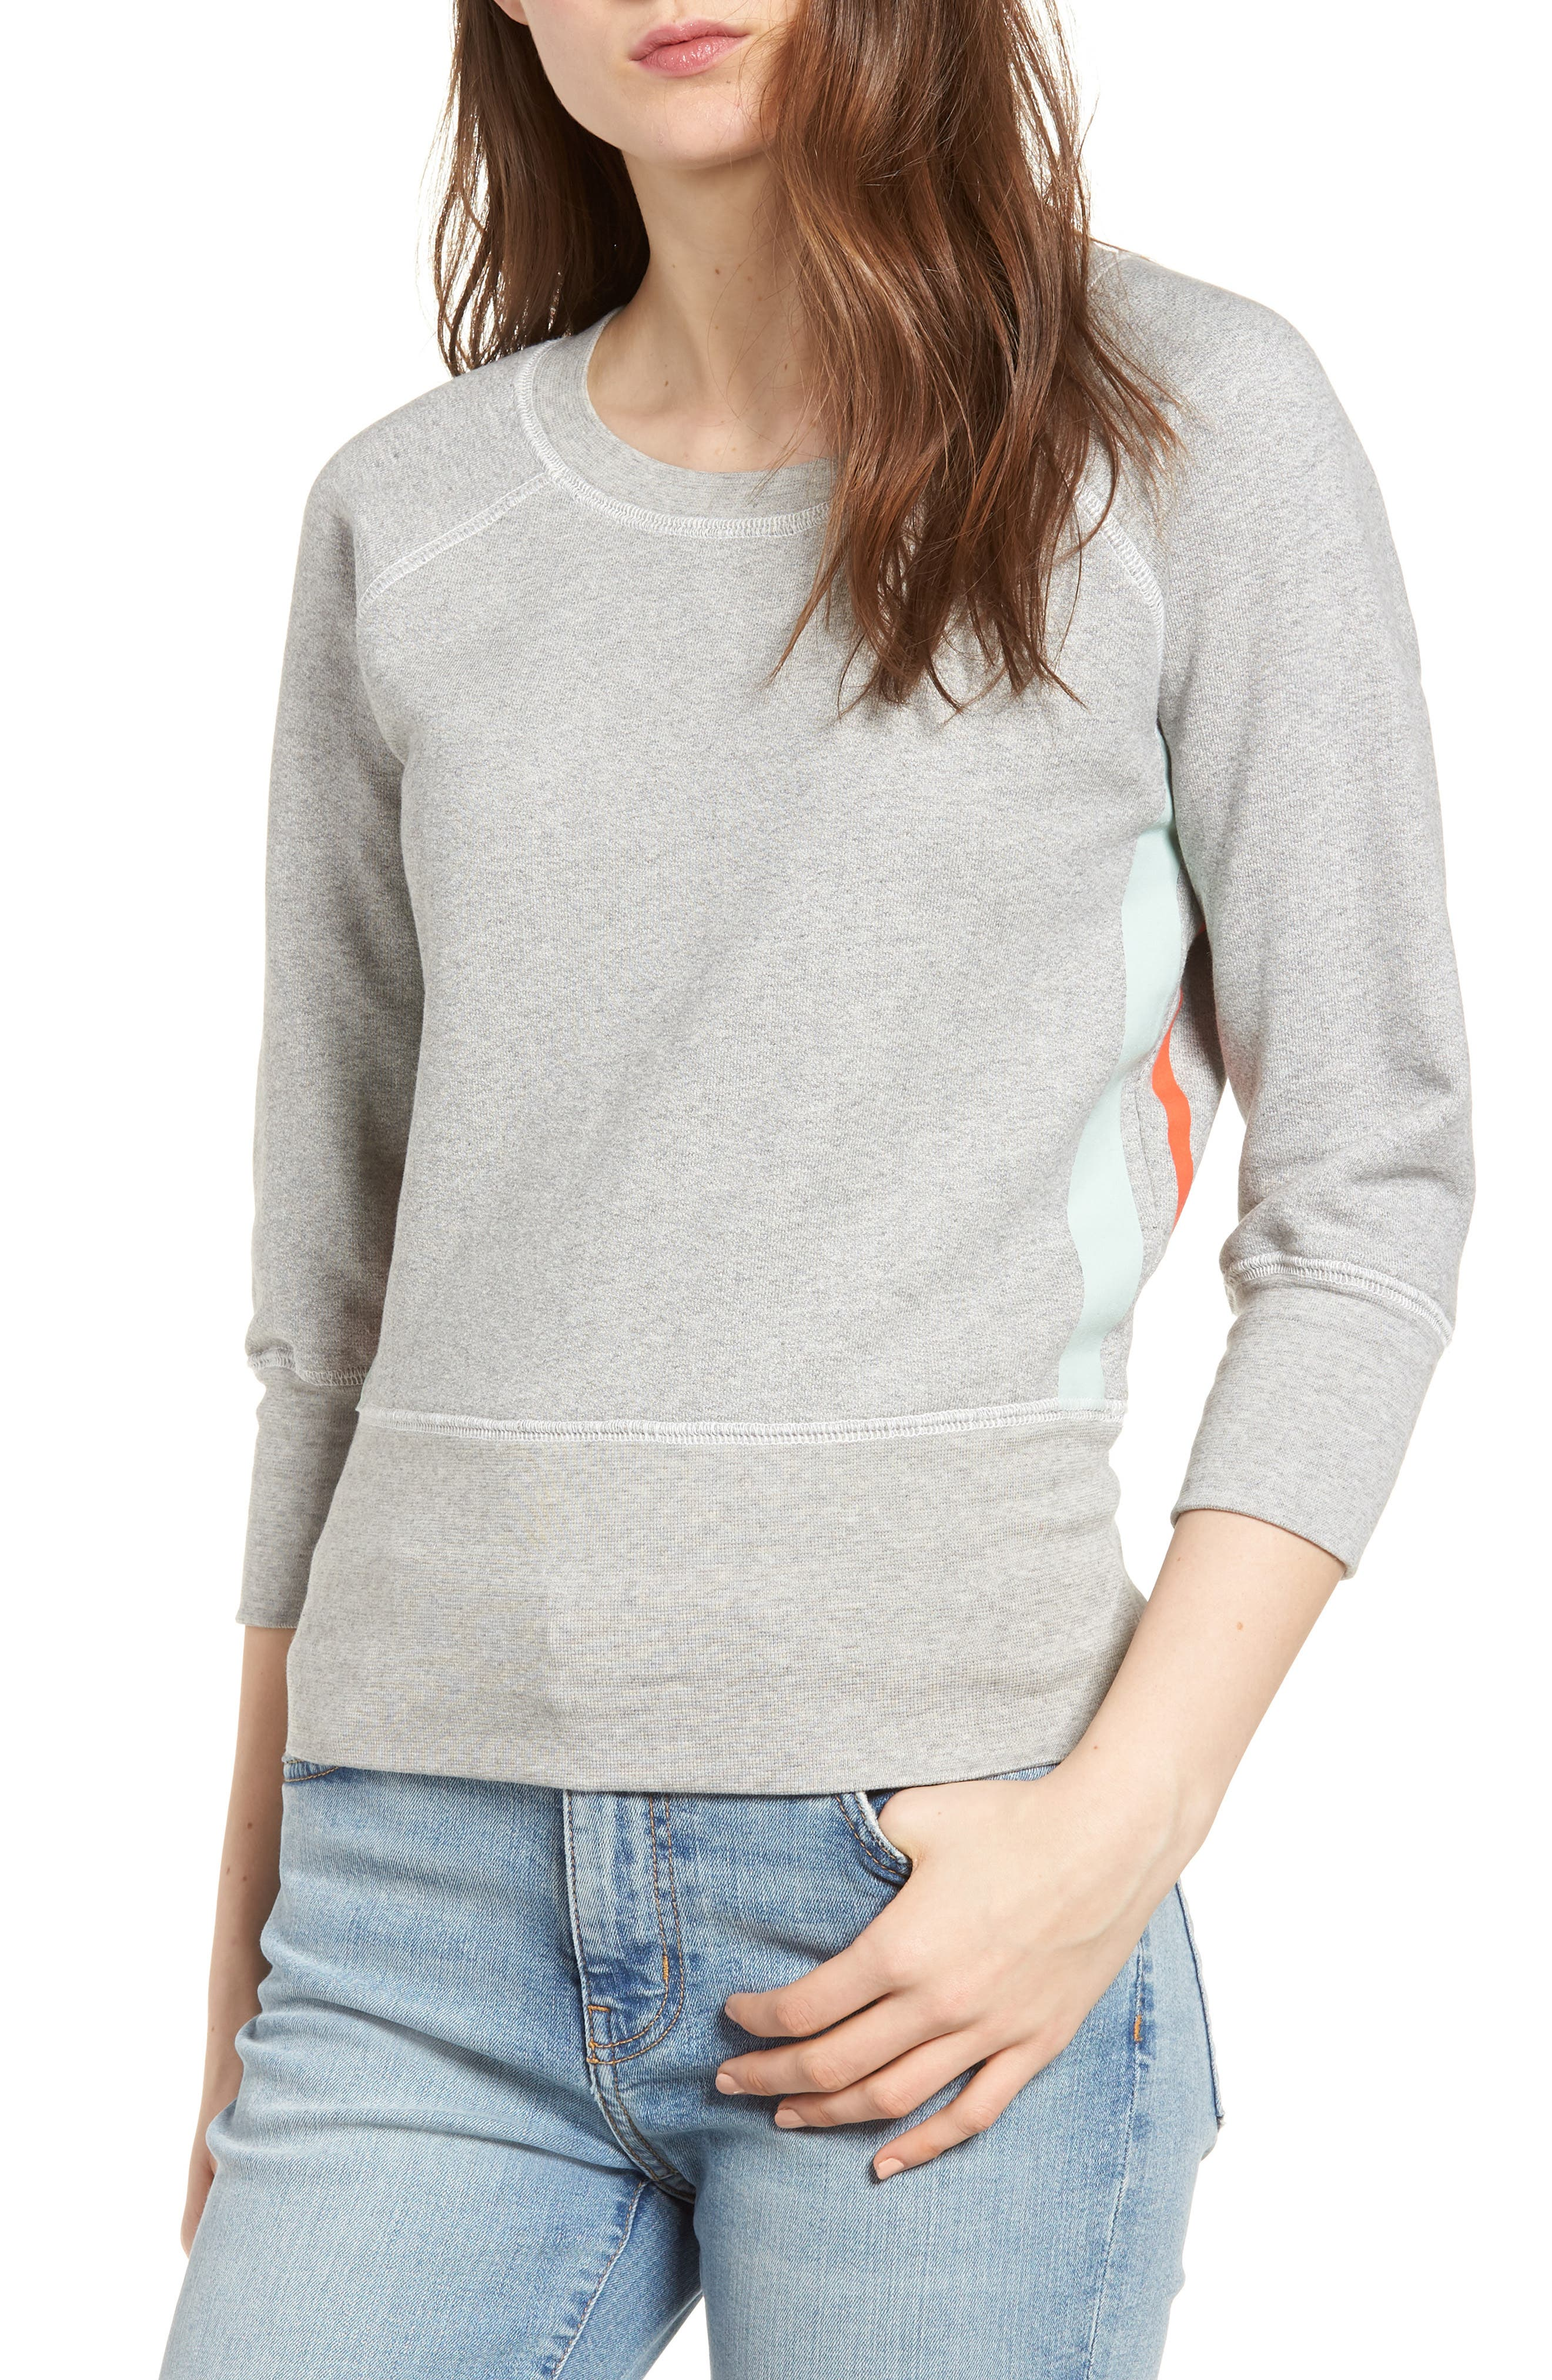 Current/Elliott The Dallas Sweatshirt